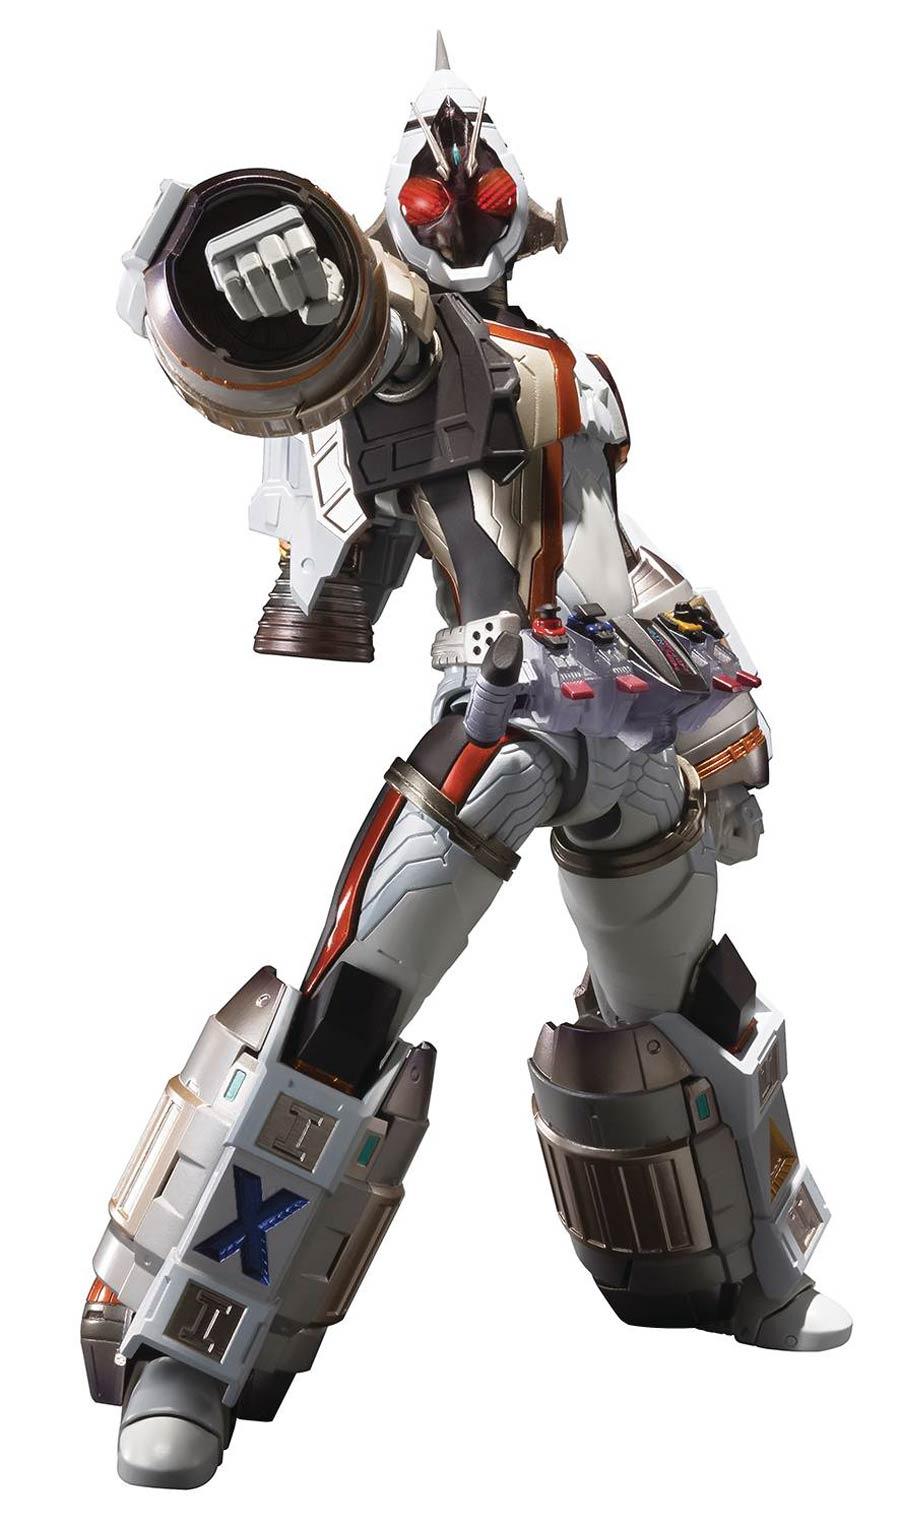 Kamen Rider S.I.C. Super Imaginative Colosseum - Kamen Rider Fourze Base States Action Figure